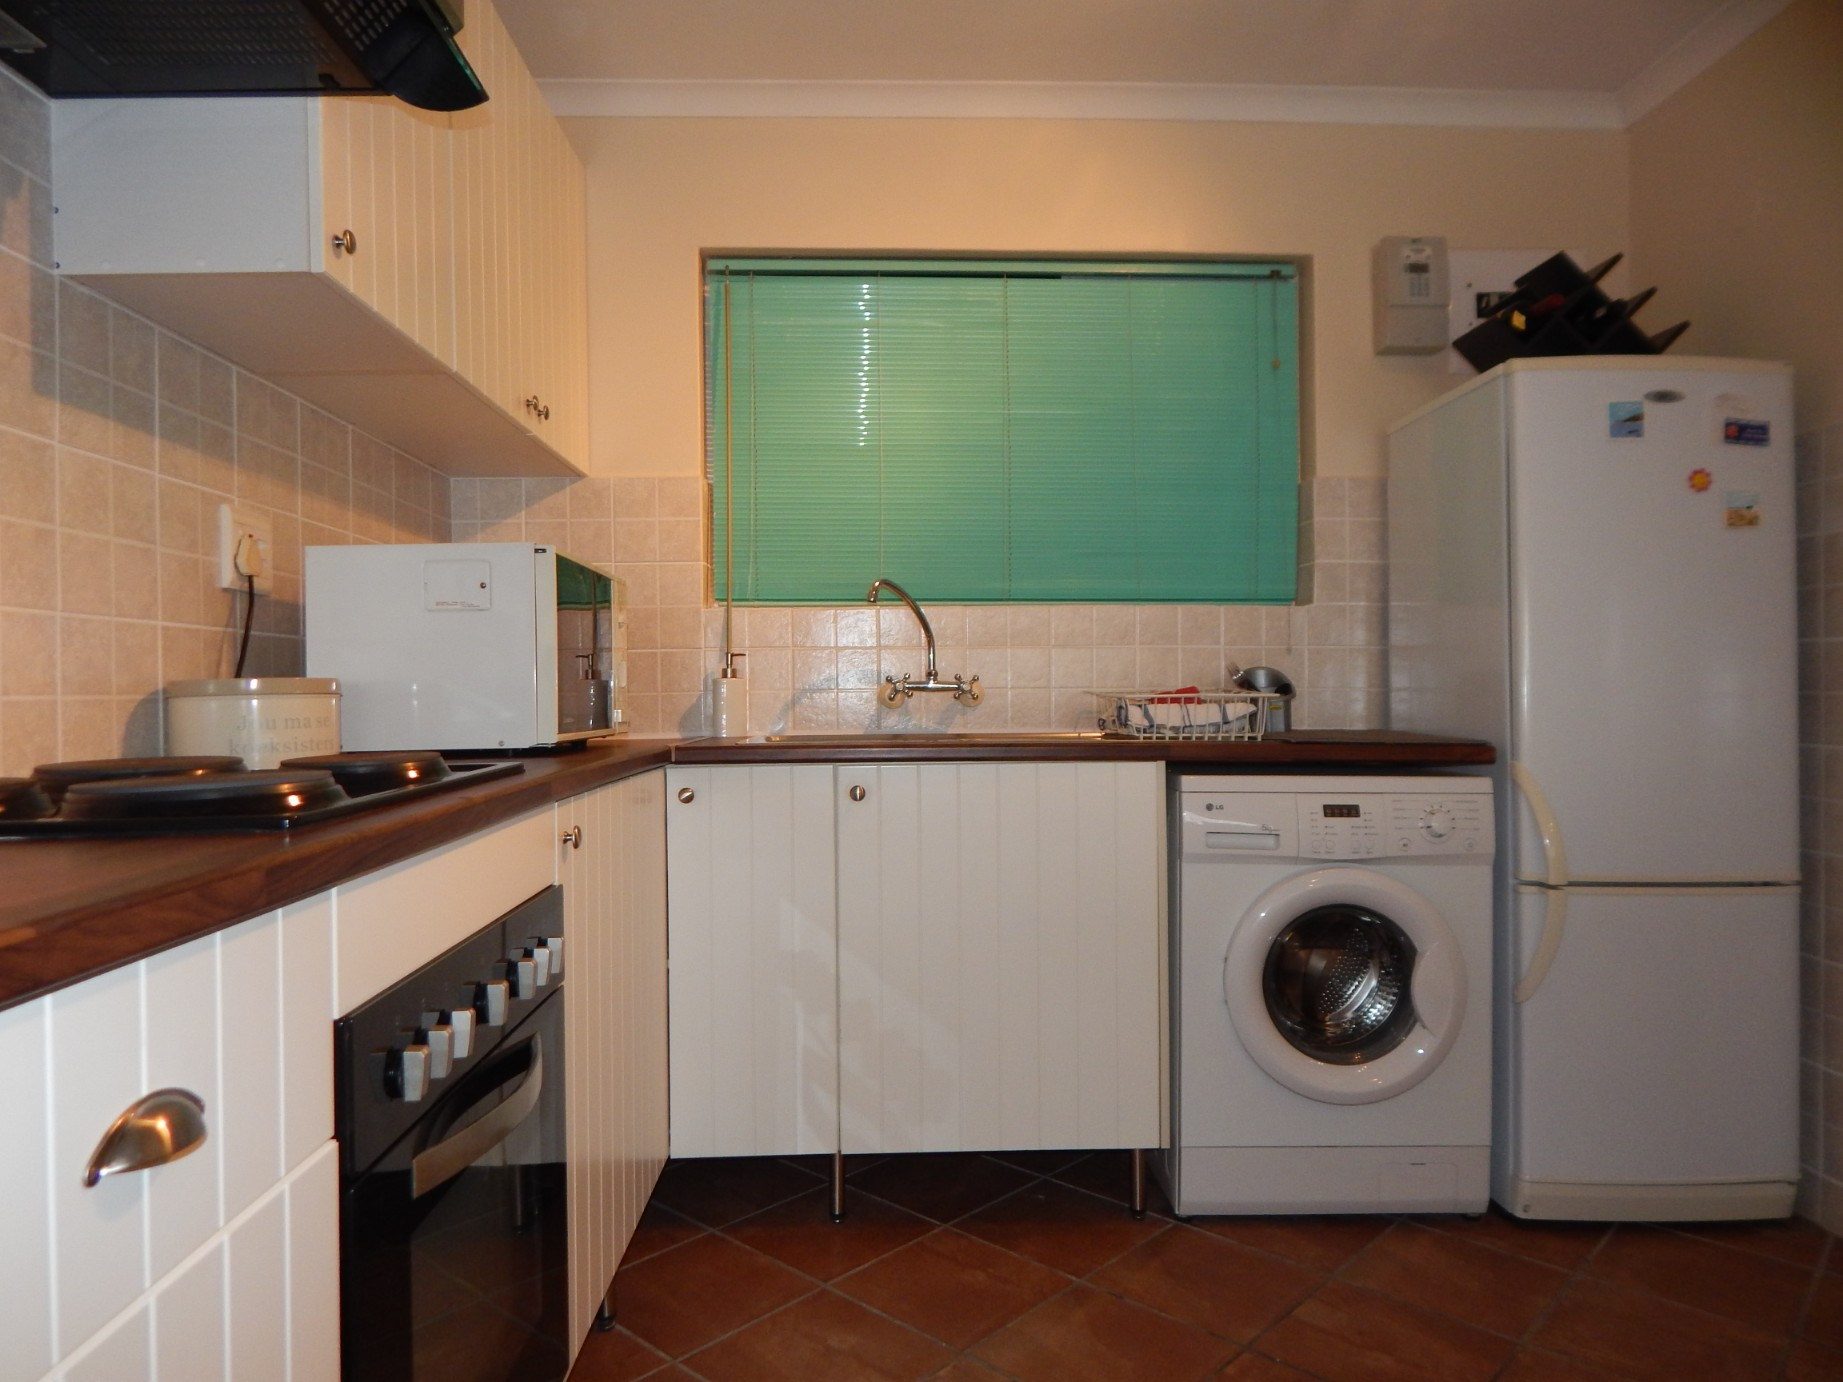 3 Bedroom Apartment for sale in De Bakke ENT0066483 : photo#9